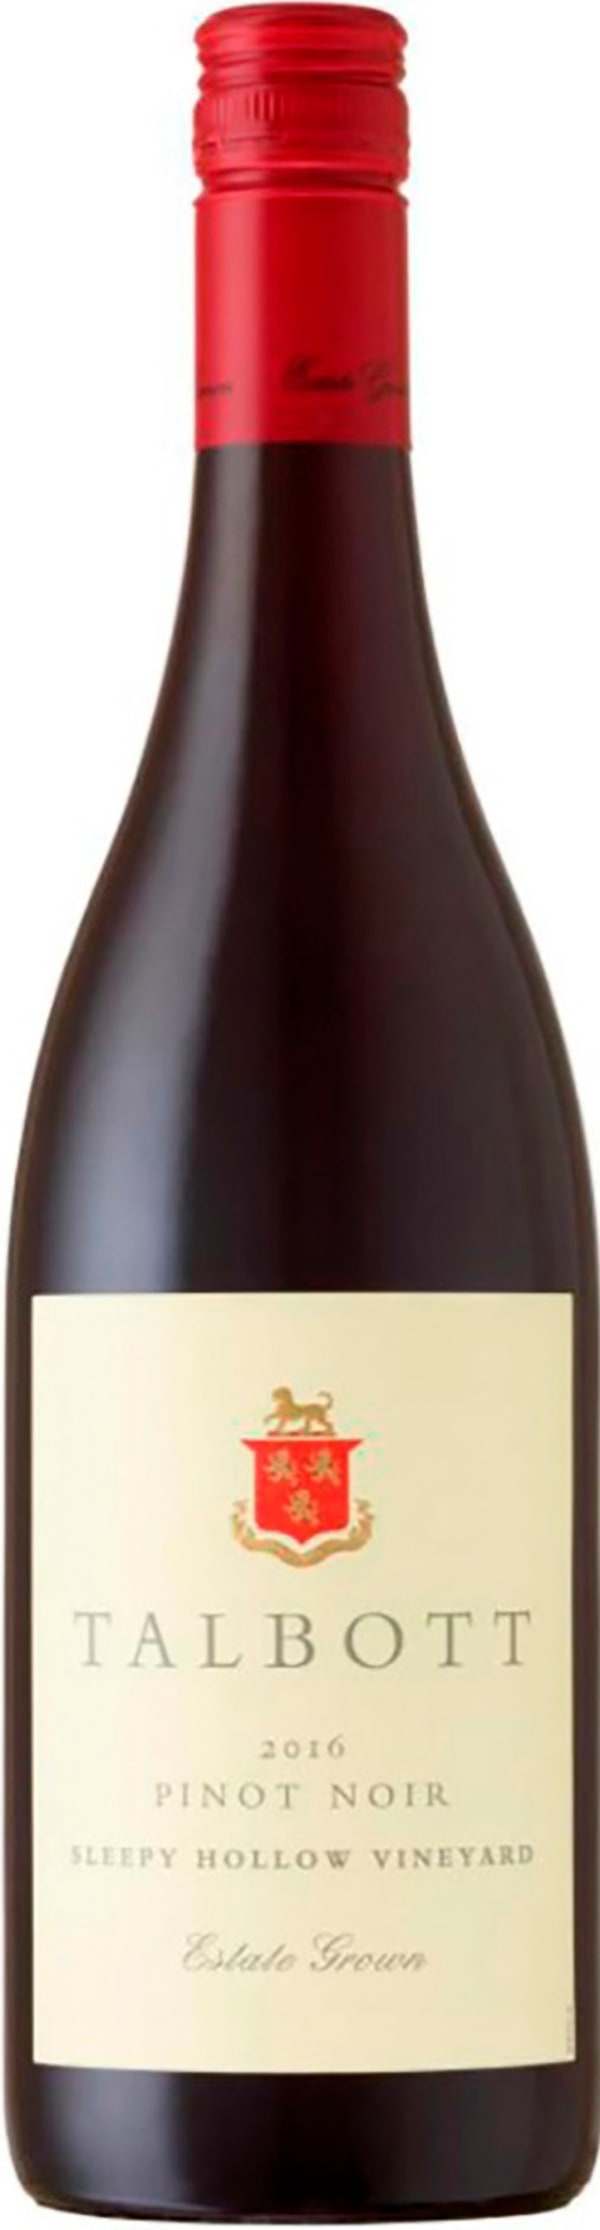 Talbott Sleepy Hollow Vineyard Pinot Noir 2016